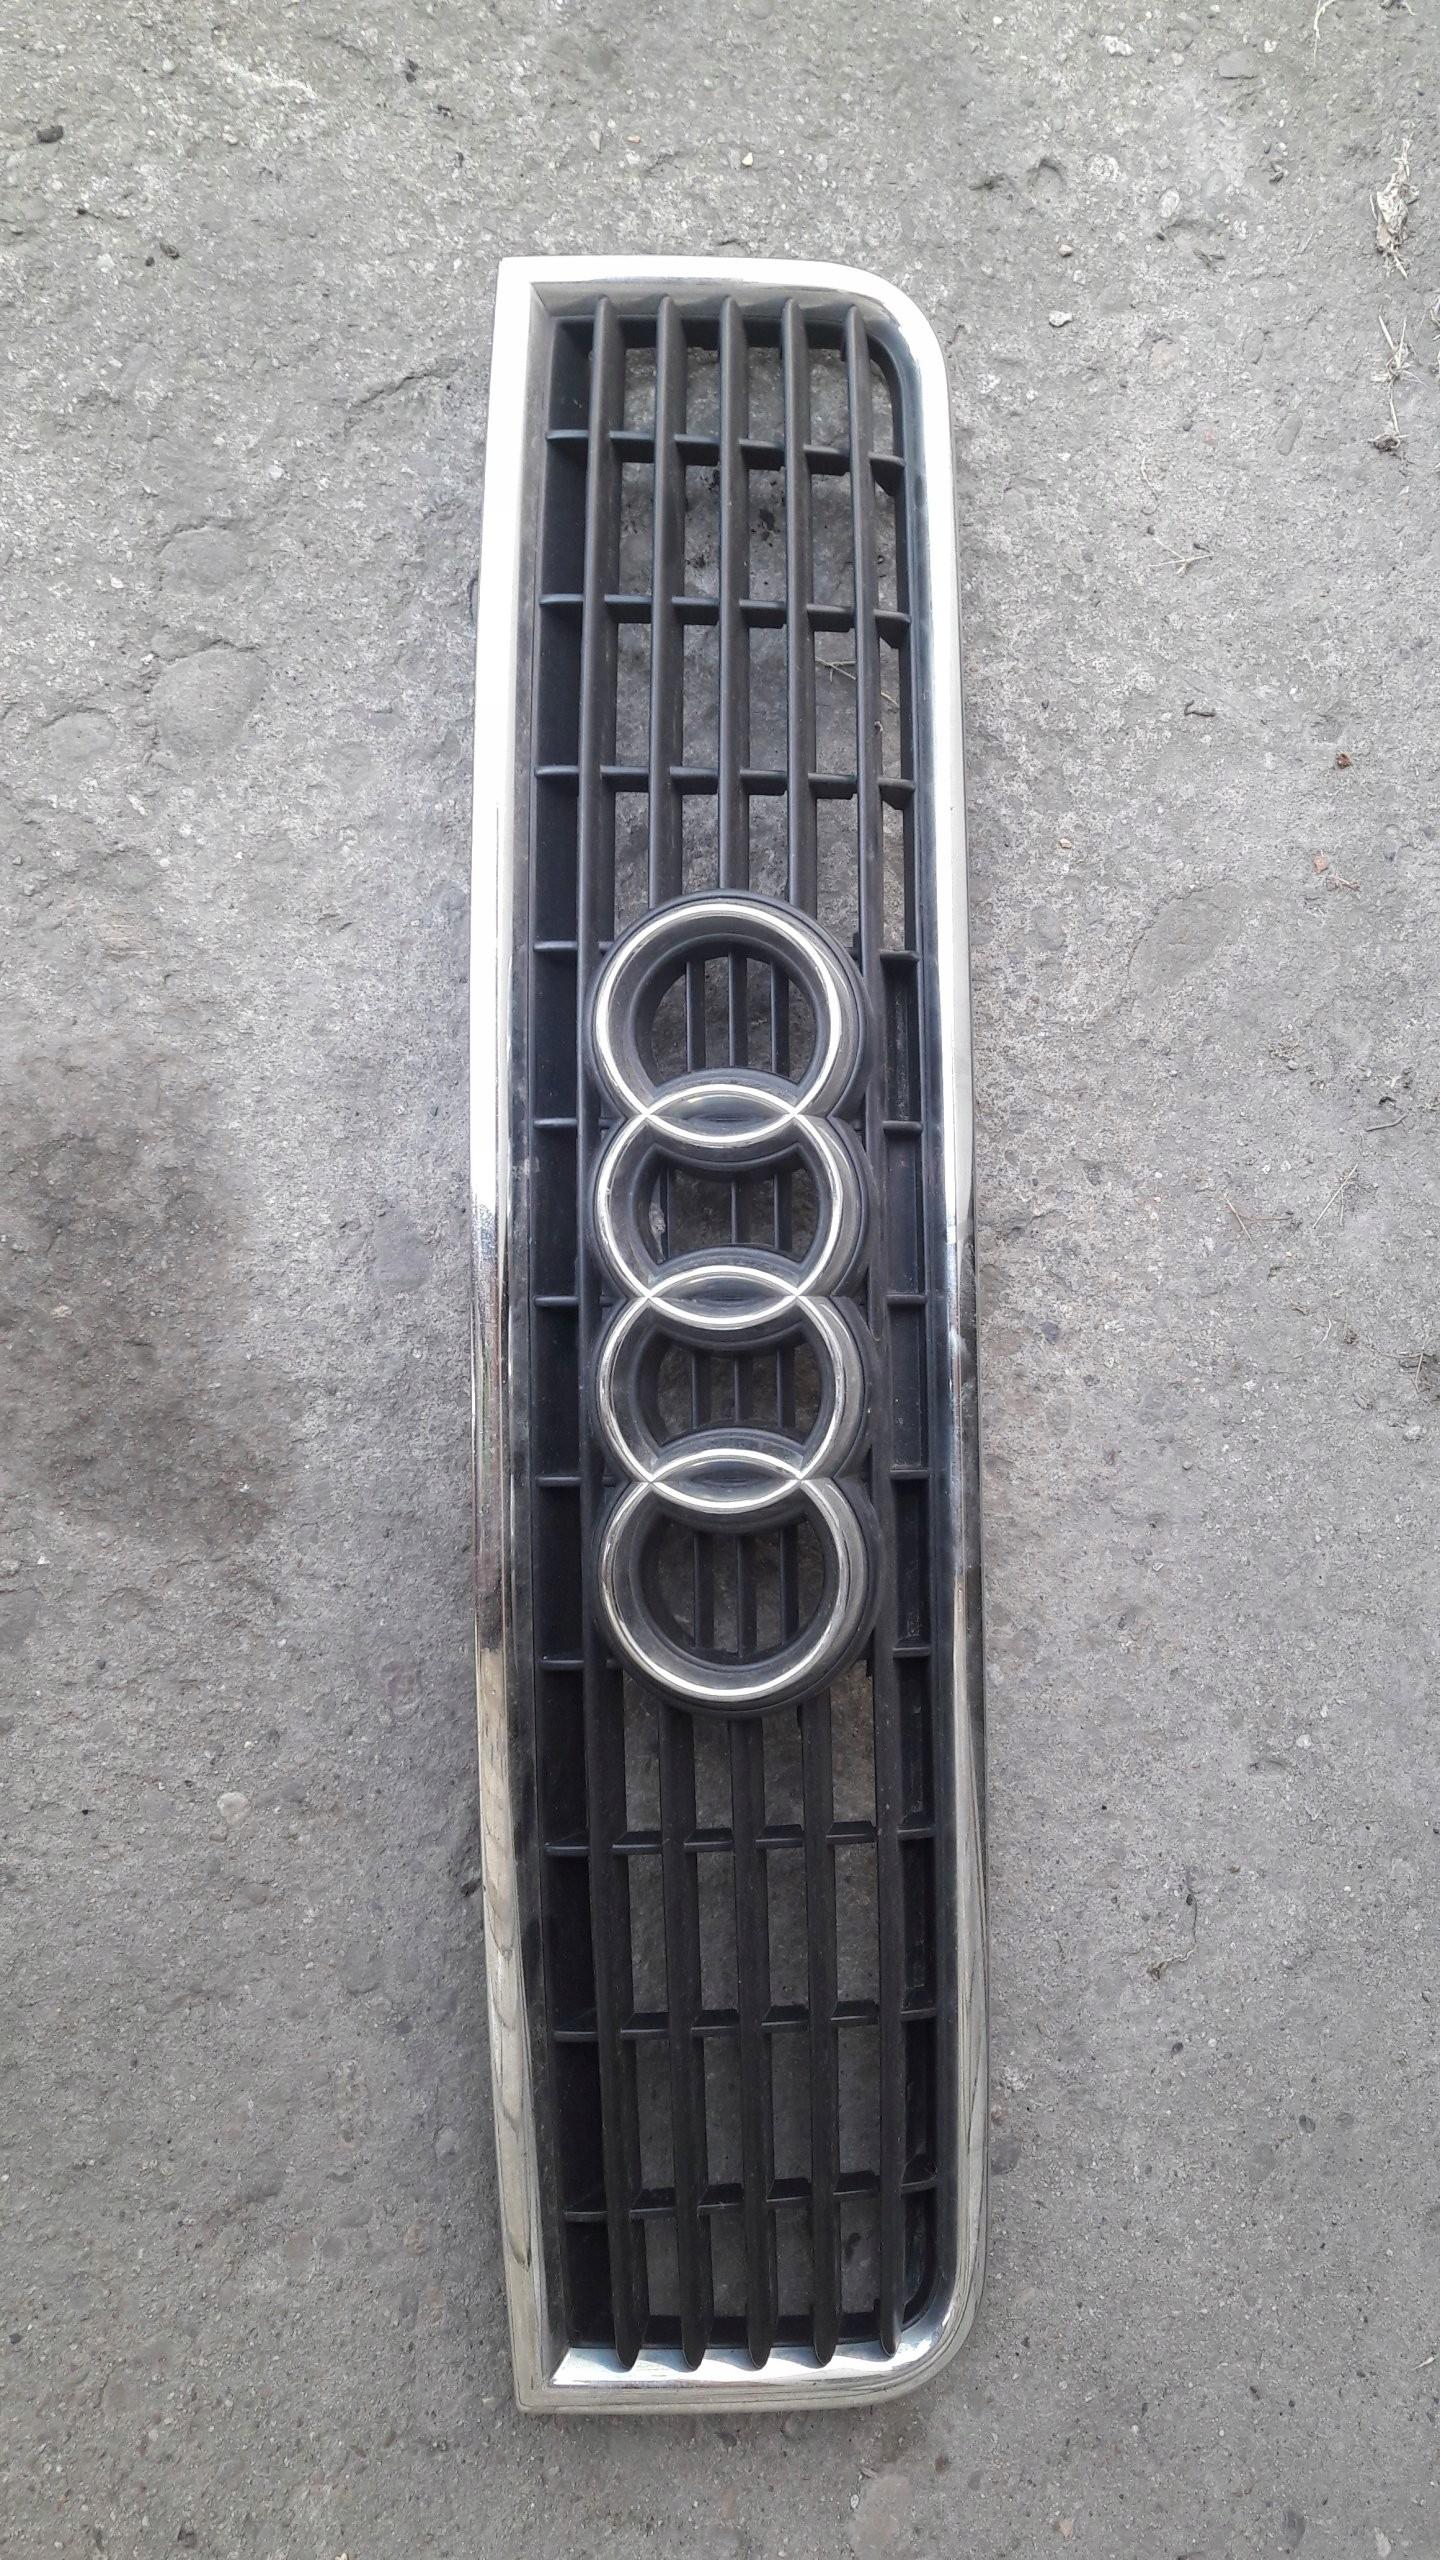 Grill Atrapa Maski Audi A4 B6 7390616348 Oficjalne Archiwum Allegro